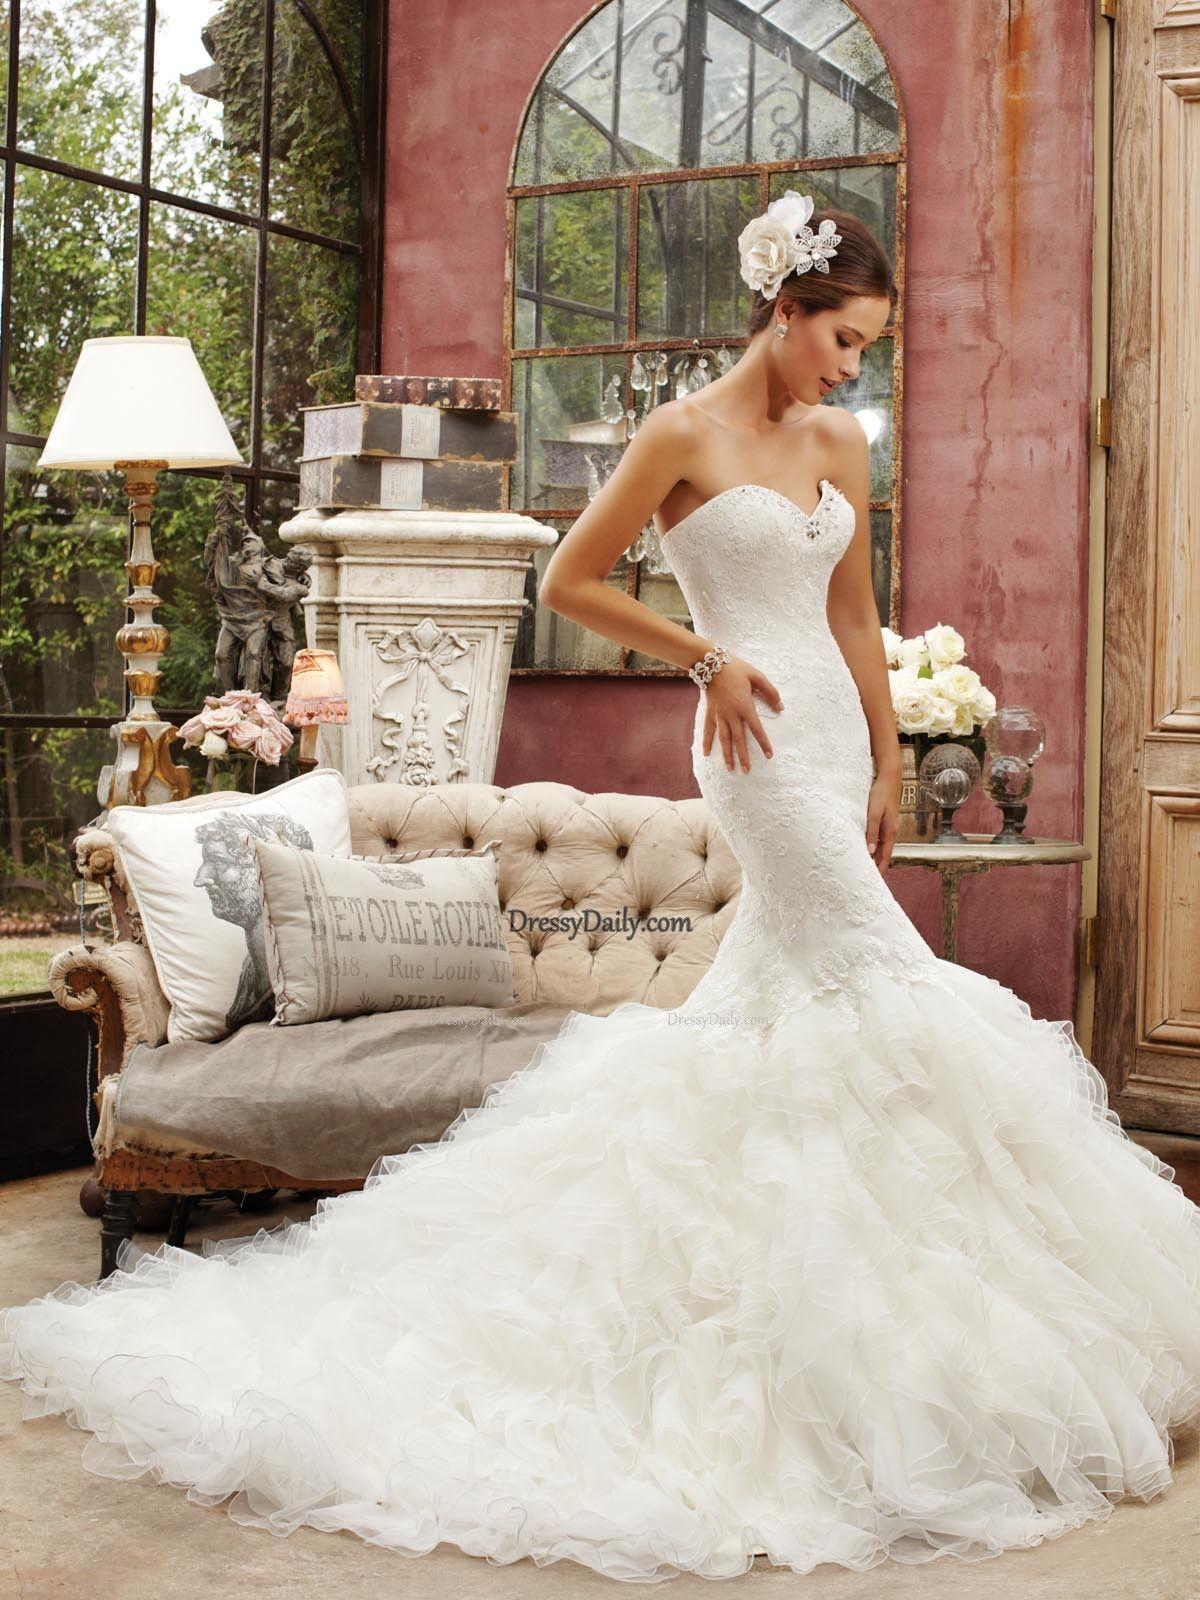 Lace With Ruffle Bottom Mermaid Wedding Dress Best Wedding Dresses Best Wedding Dress Designers Sophia Tolli Wedding Dresses [ 1600 x 1200 Pixel ]